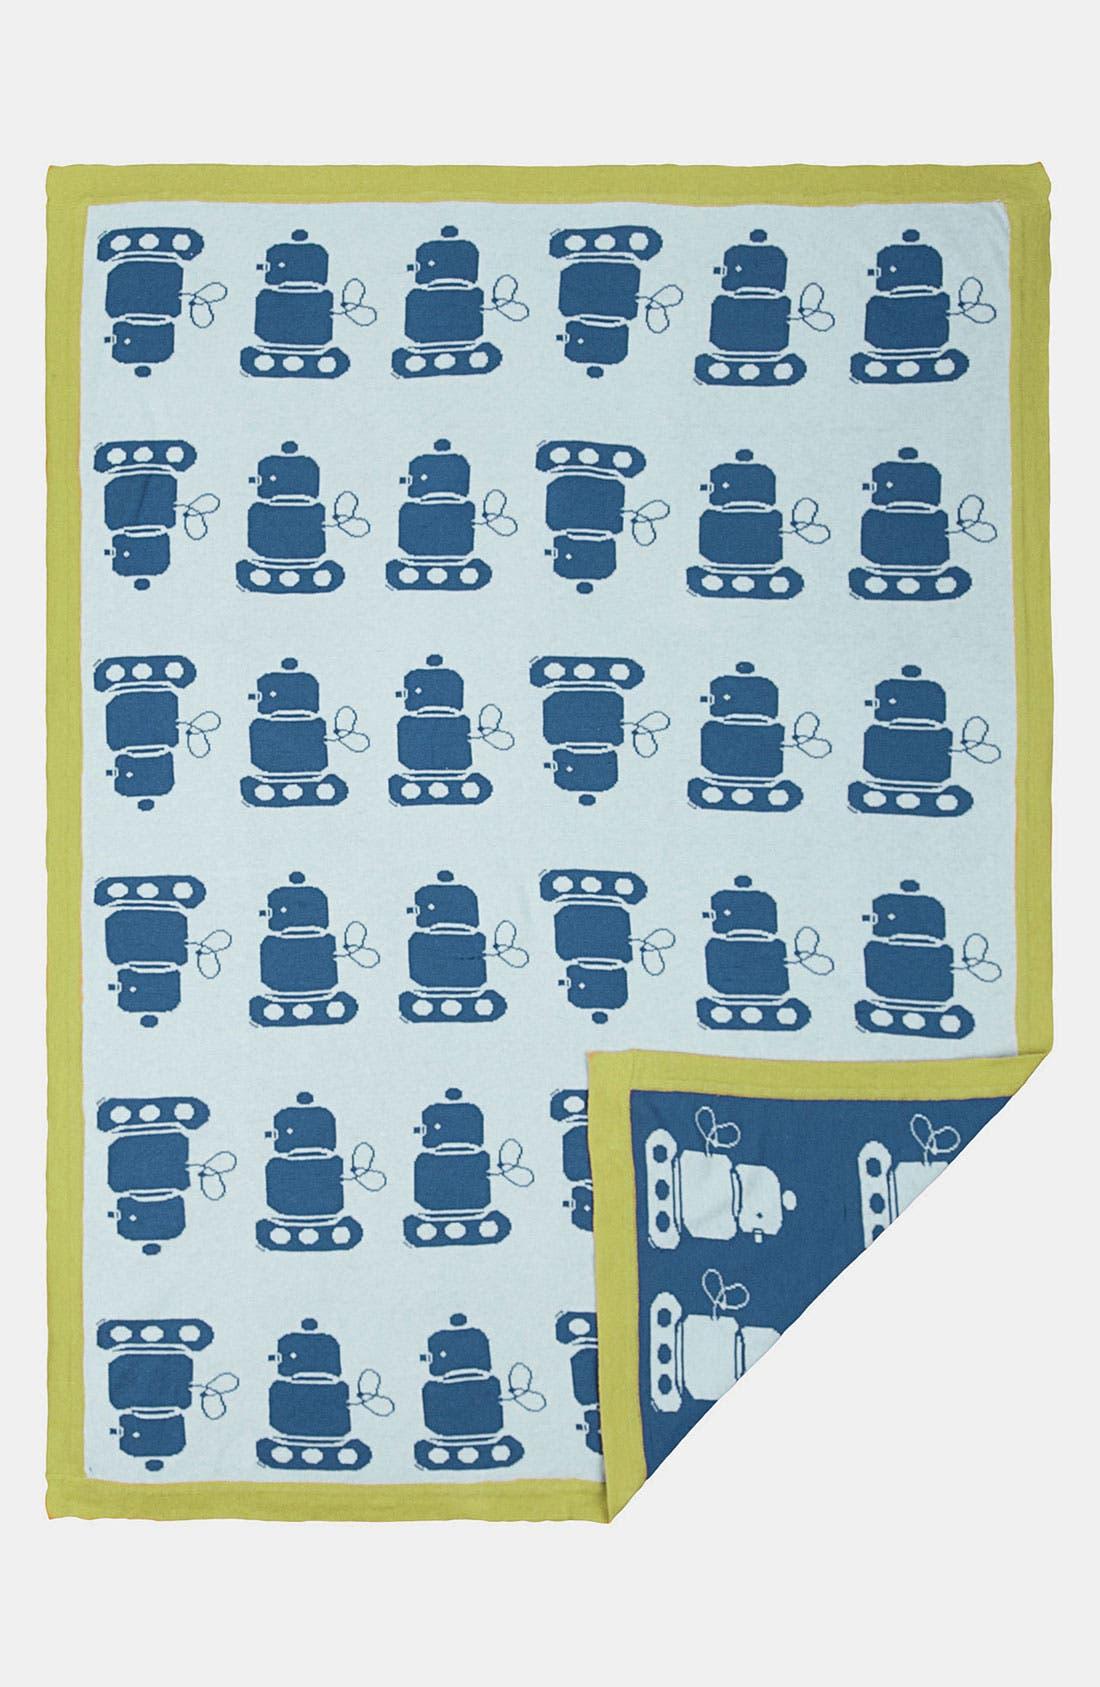 Alternate Image 1 Selected - Living Textiles 'Mod Robot' Jacquard Blanket